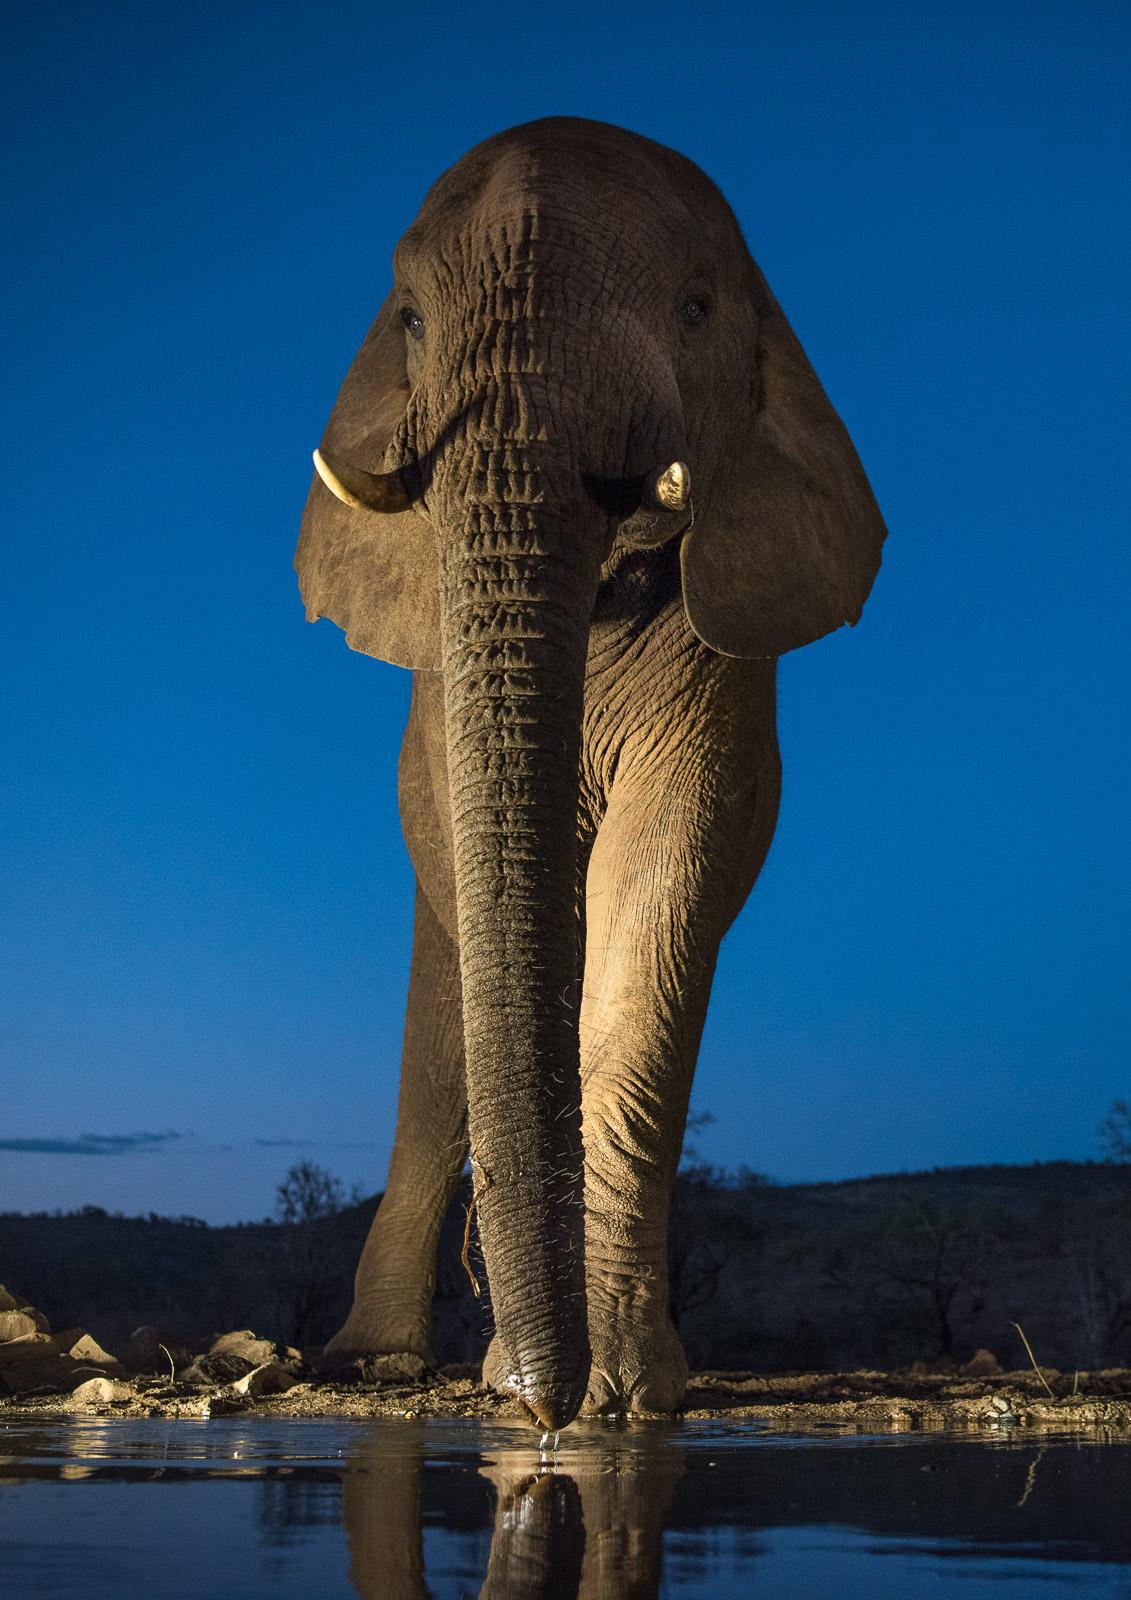 UMGODI: Elephant  Nikon D810 24-70mm f2.8 at 30mm. 1/100, f3.2, ISO800